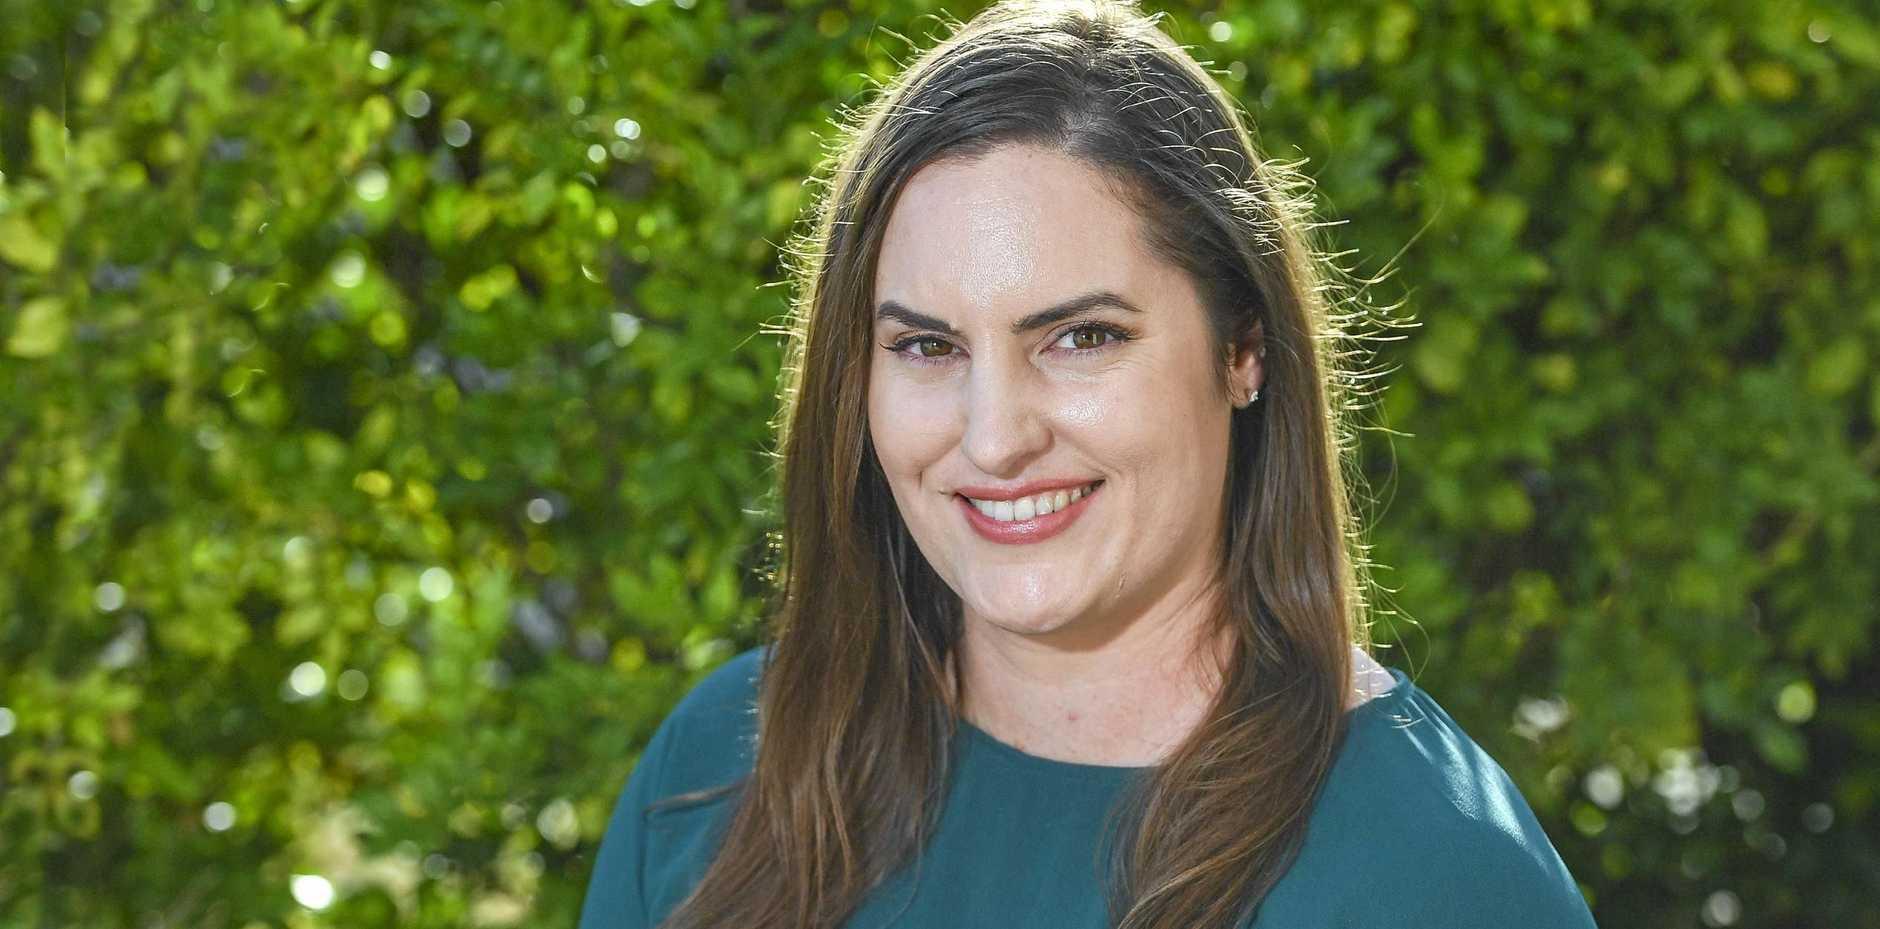 Megan Sheehan, Editor of the News Mail